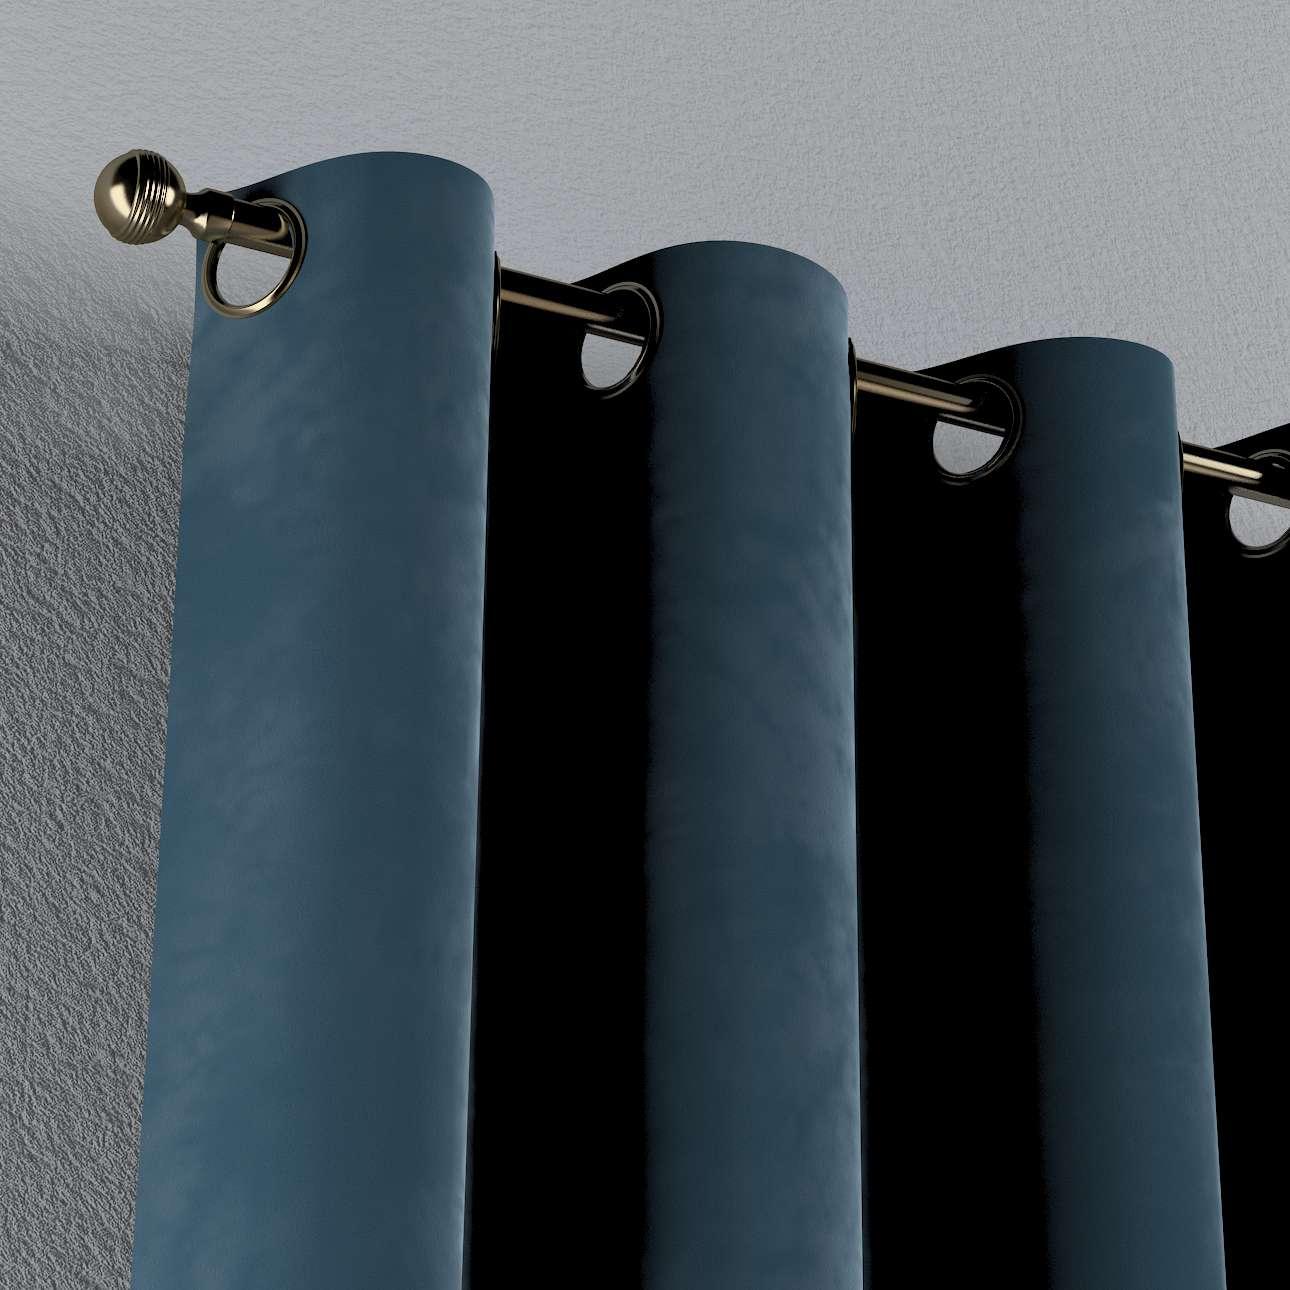 Zasłona na kółkach 1 szt. w kolekcji Velvet, tkanina: 704-16